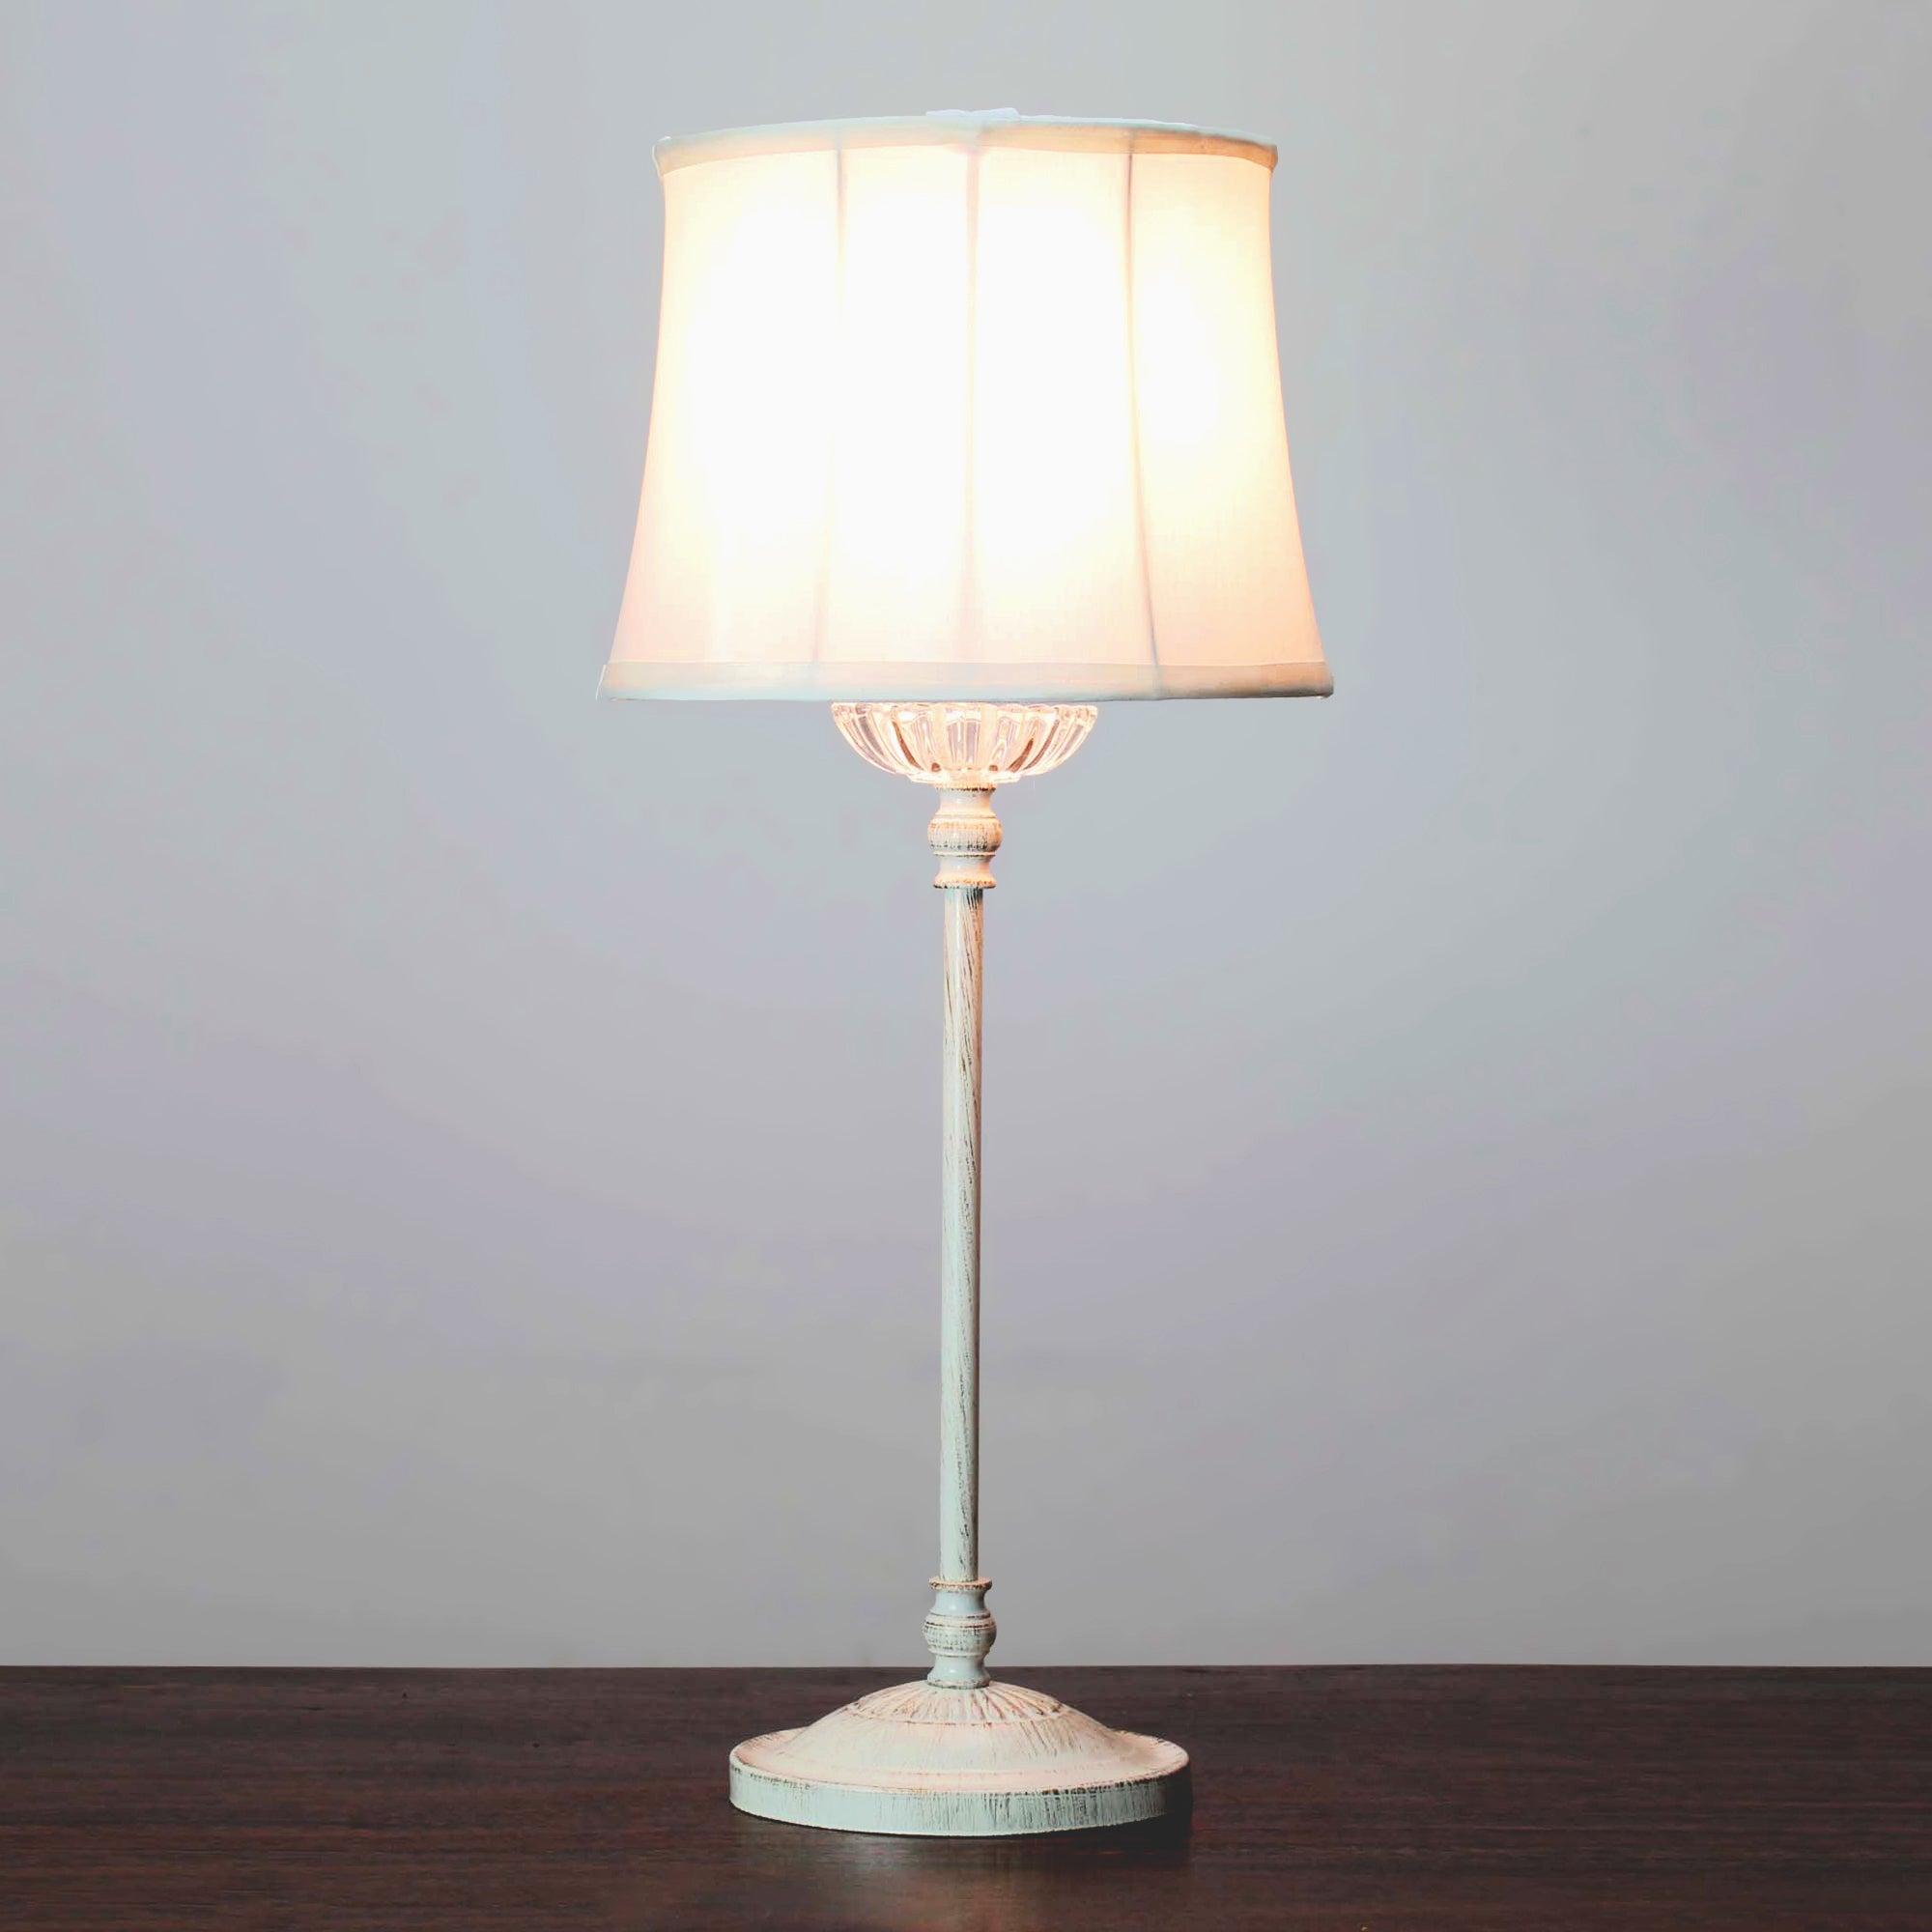 erica cream candlestick table lamp dunelm. Black Bedroom Furniture Sets. Home Design Ideas